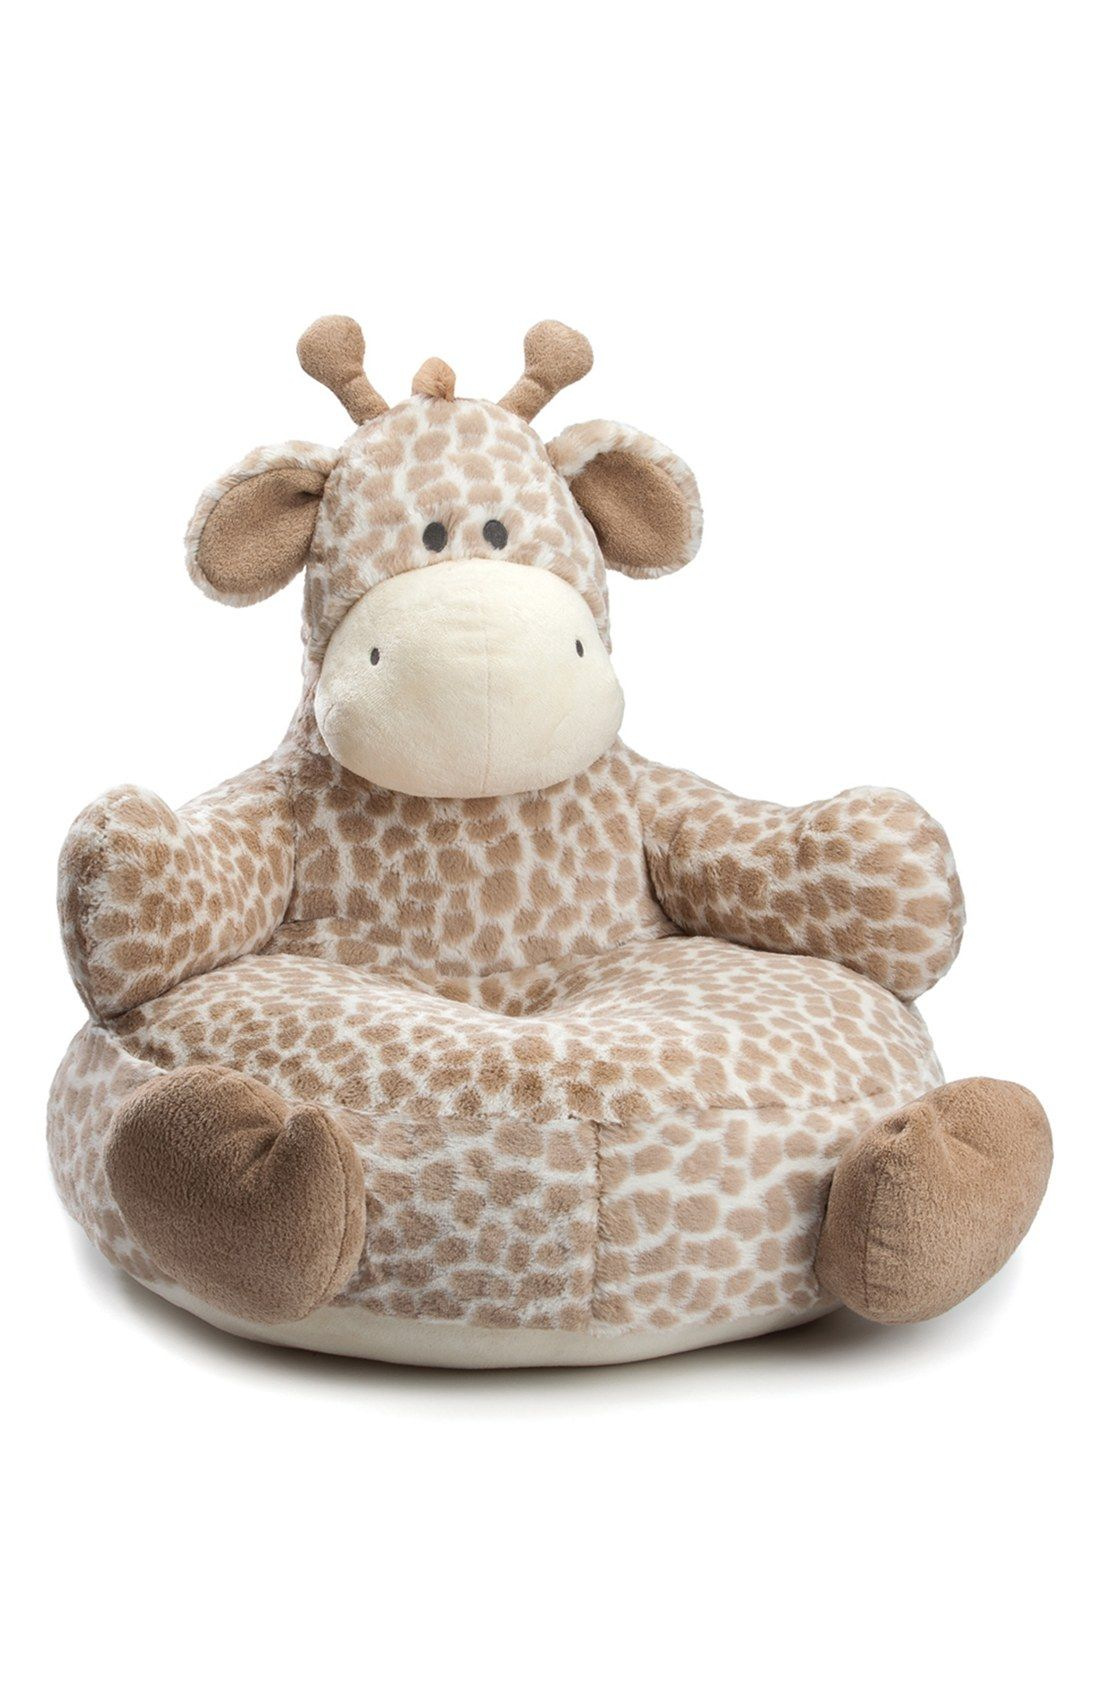 children s stuffed animal chairs swivel chair outdoor furniture infant nat and jules giraffe plush baby scarlett o